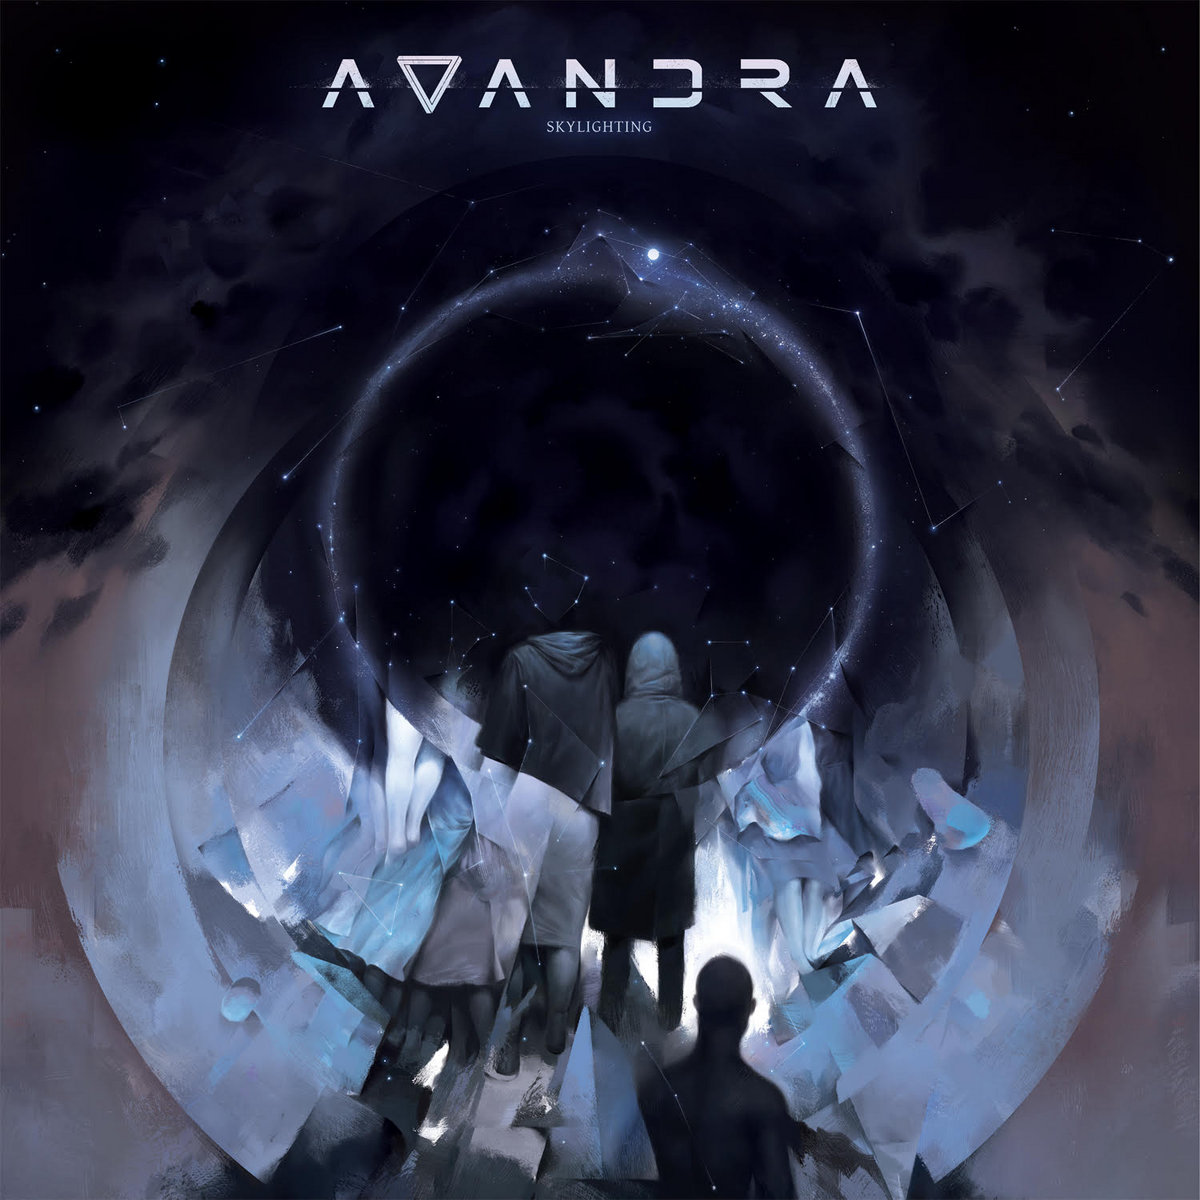 Avandra – Skylighting